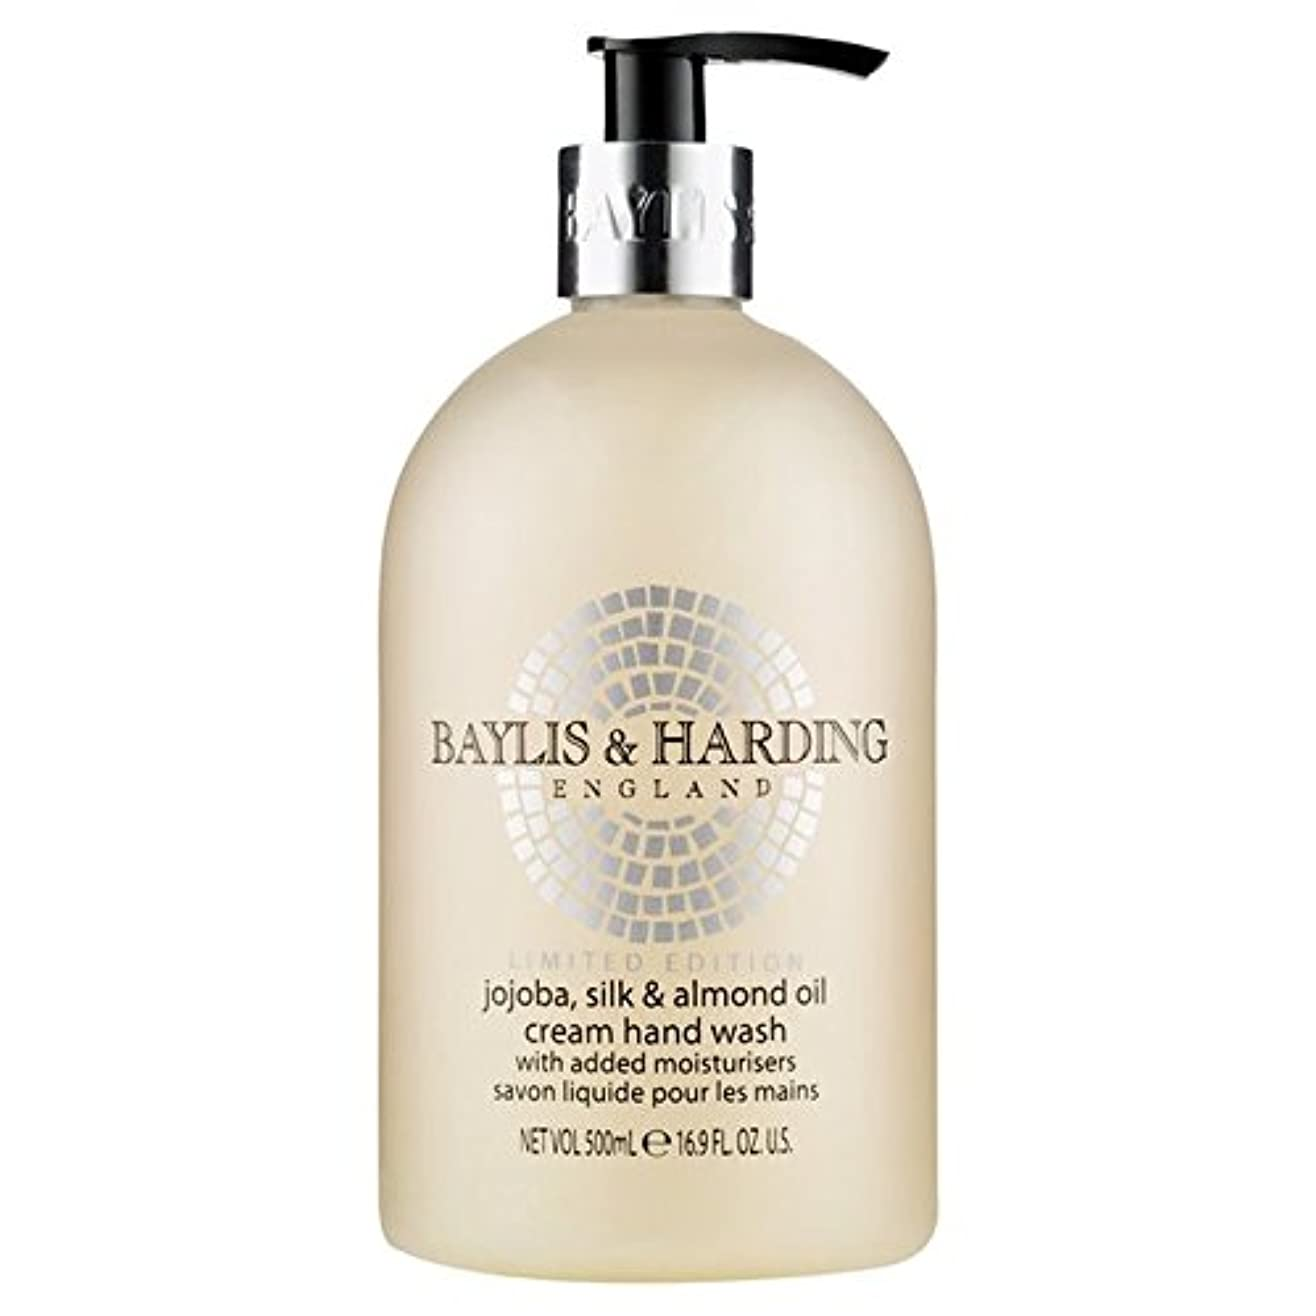 Baylis & Harding Jojoba, Silk & Almond Oil Hand Wash 500ml - ベイリス&ハーディングホホバ、シルク&アーモンドオイルハンドウォッシュ500ミリリットル [並行輸入品]